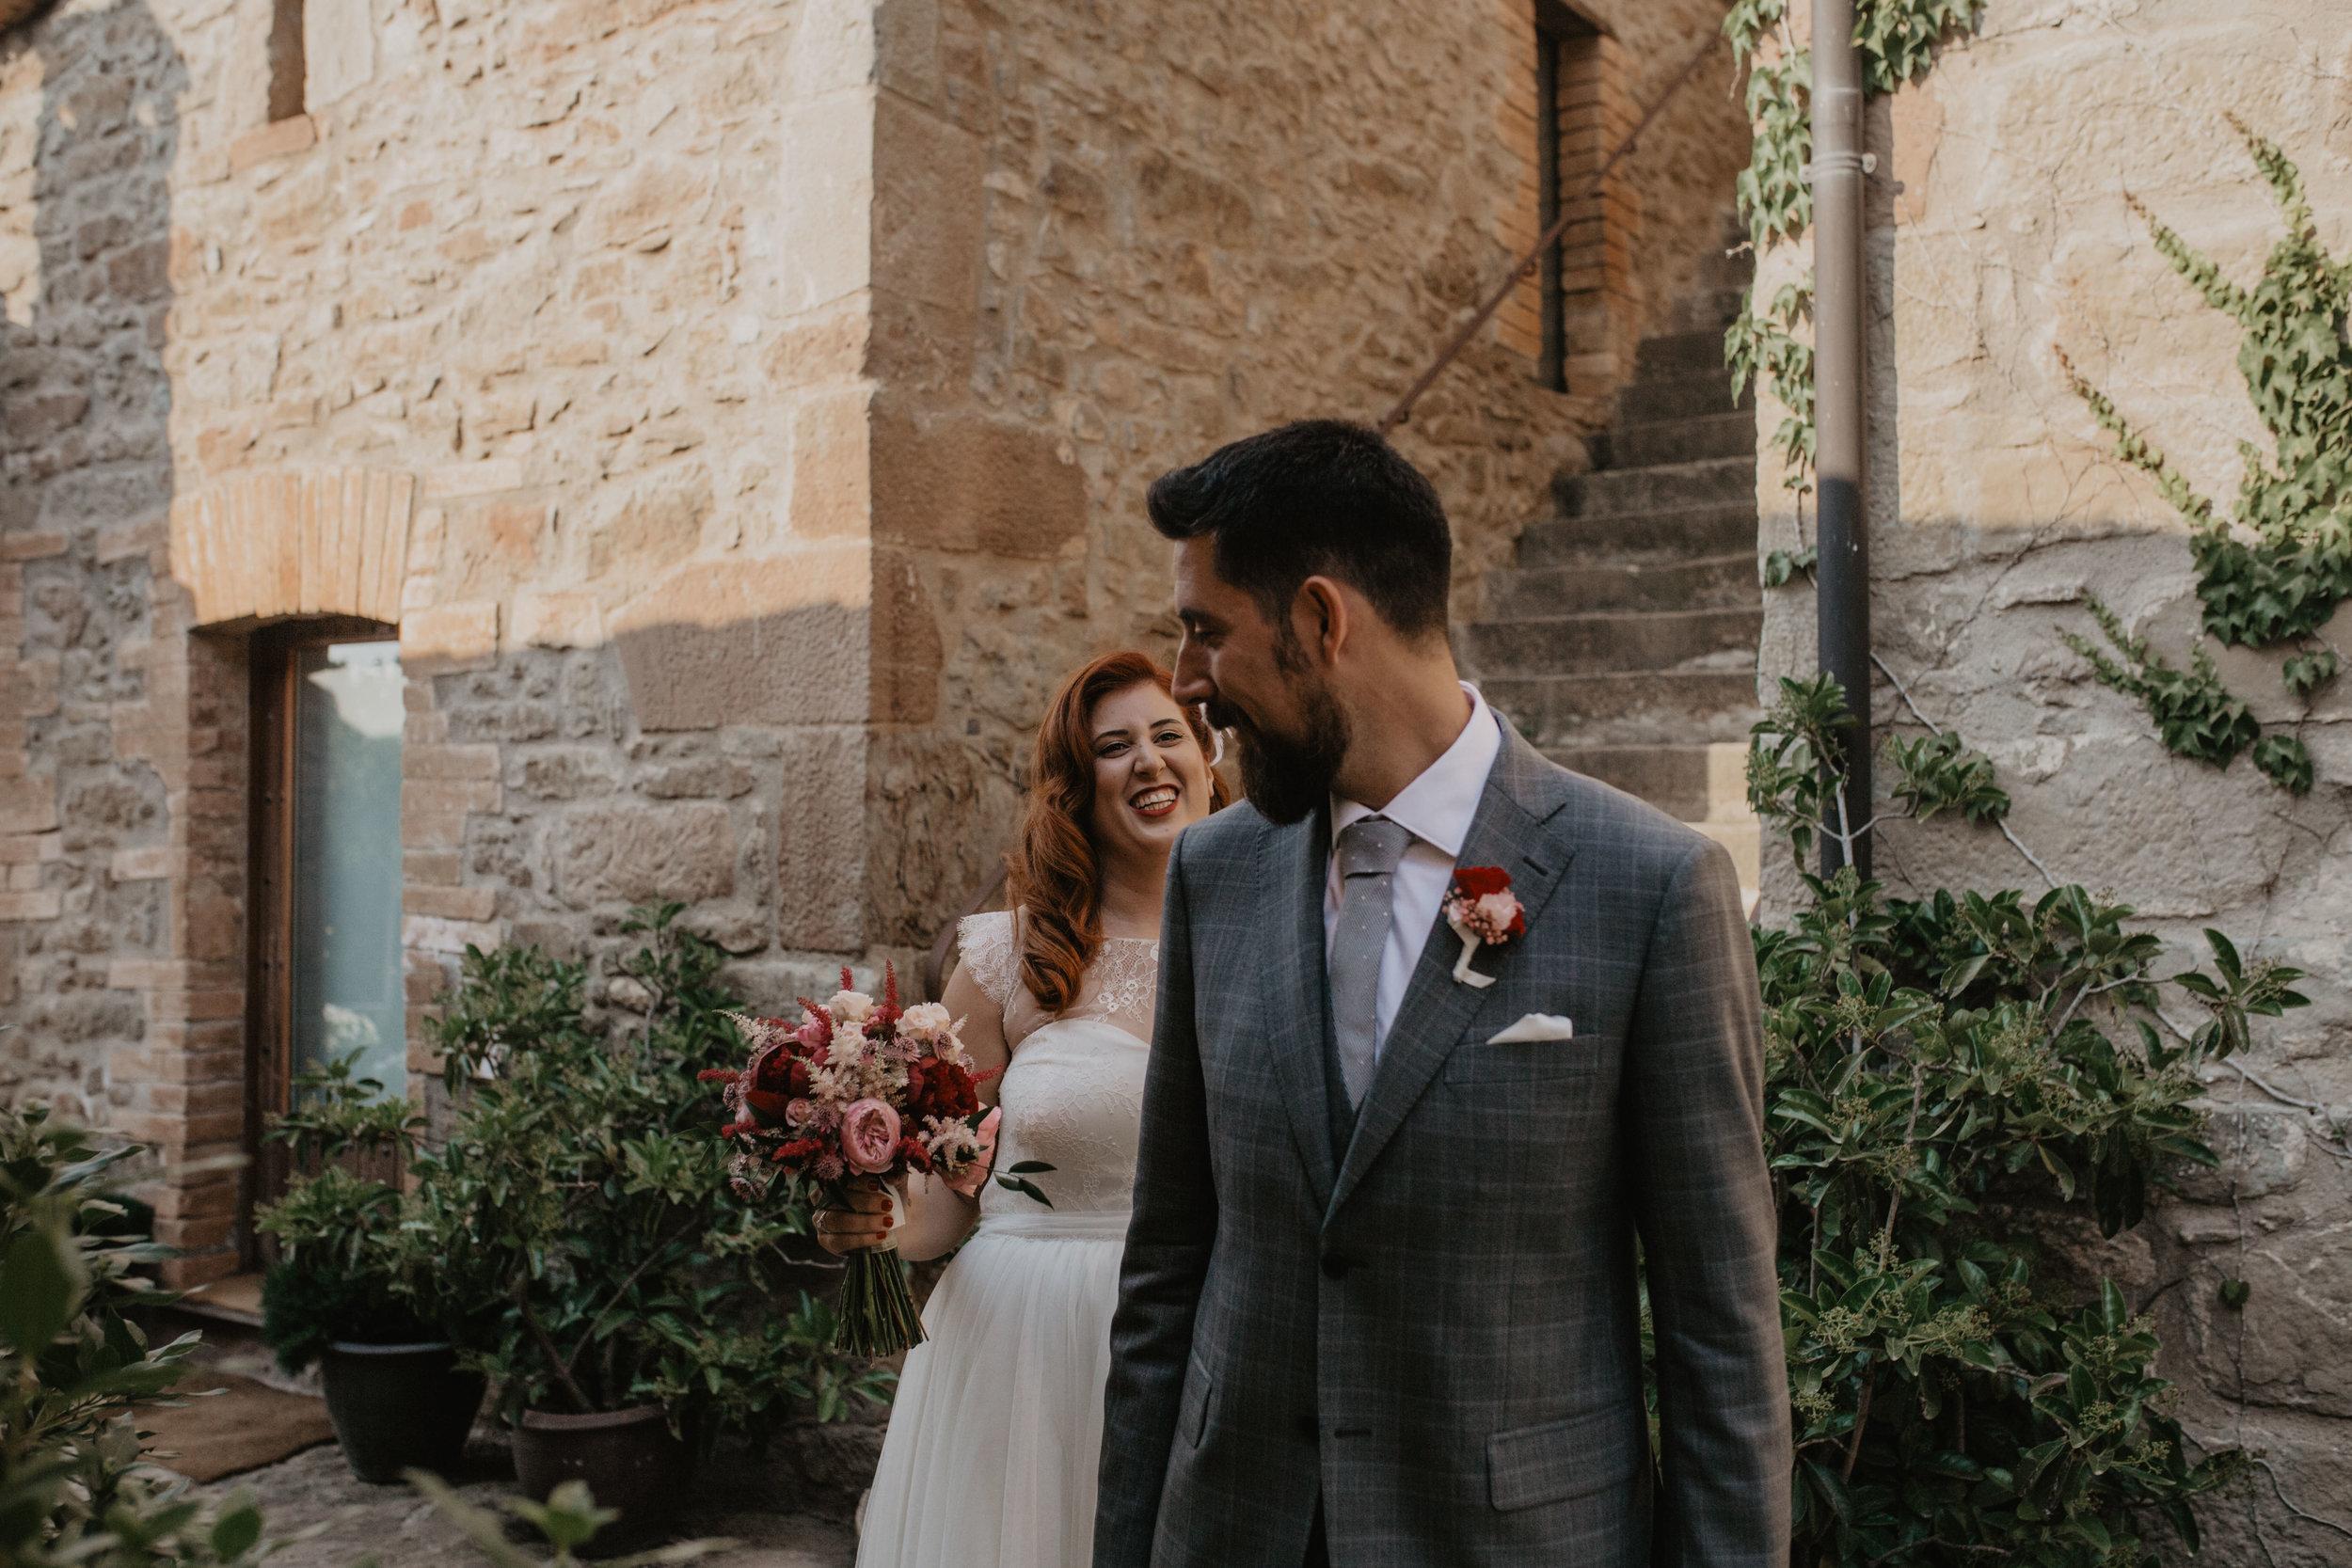 thenortherngirlphotography_photography_thenortherngirl_rebeccascabros_wedding_weddingphotography_masialagarrigadecastelladral_joaniemma_bodaenbarcelona_weddingphotographer_emmaijoan-237.jpg